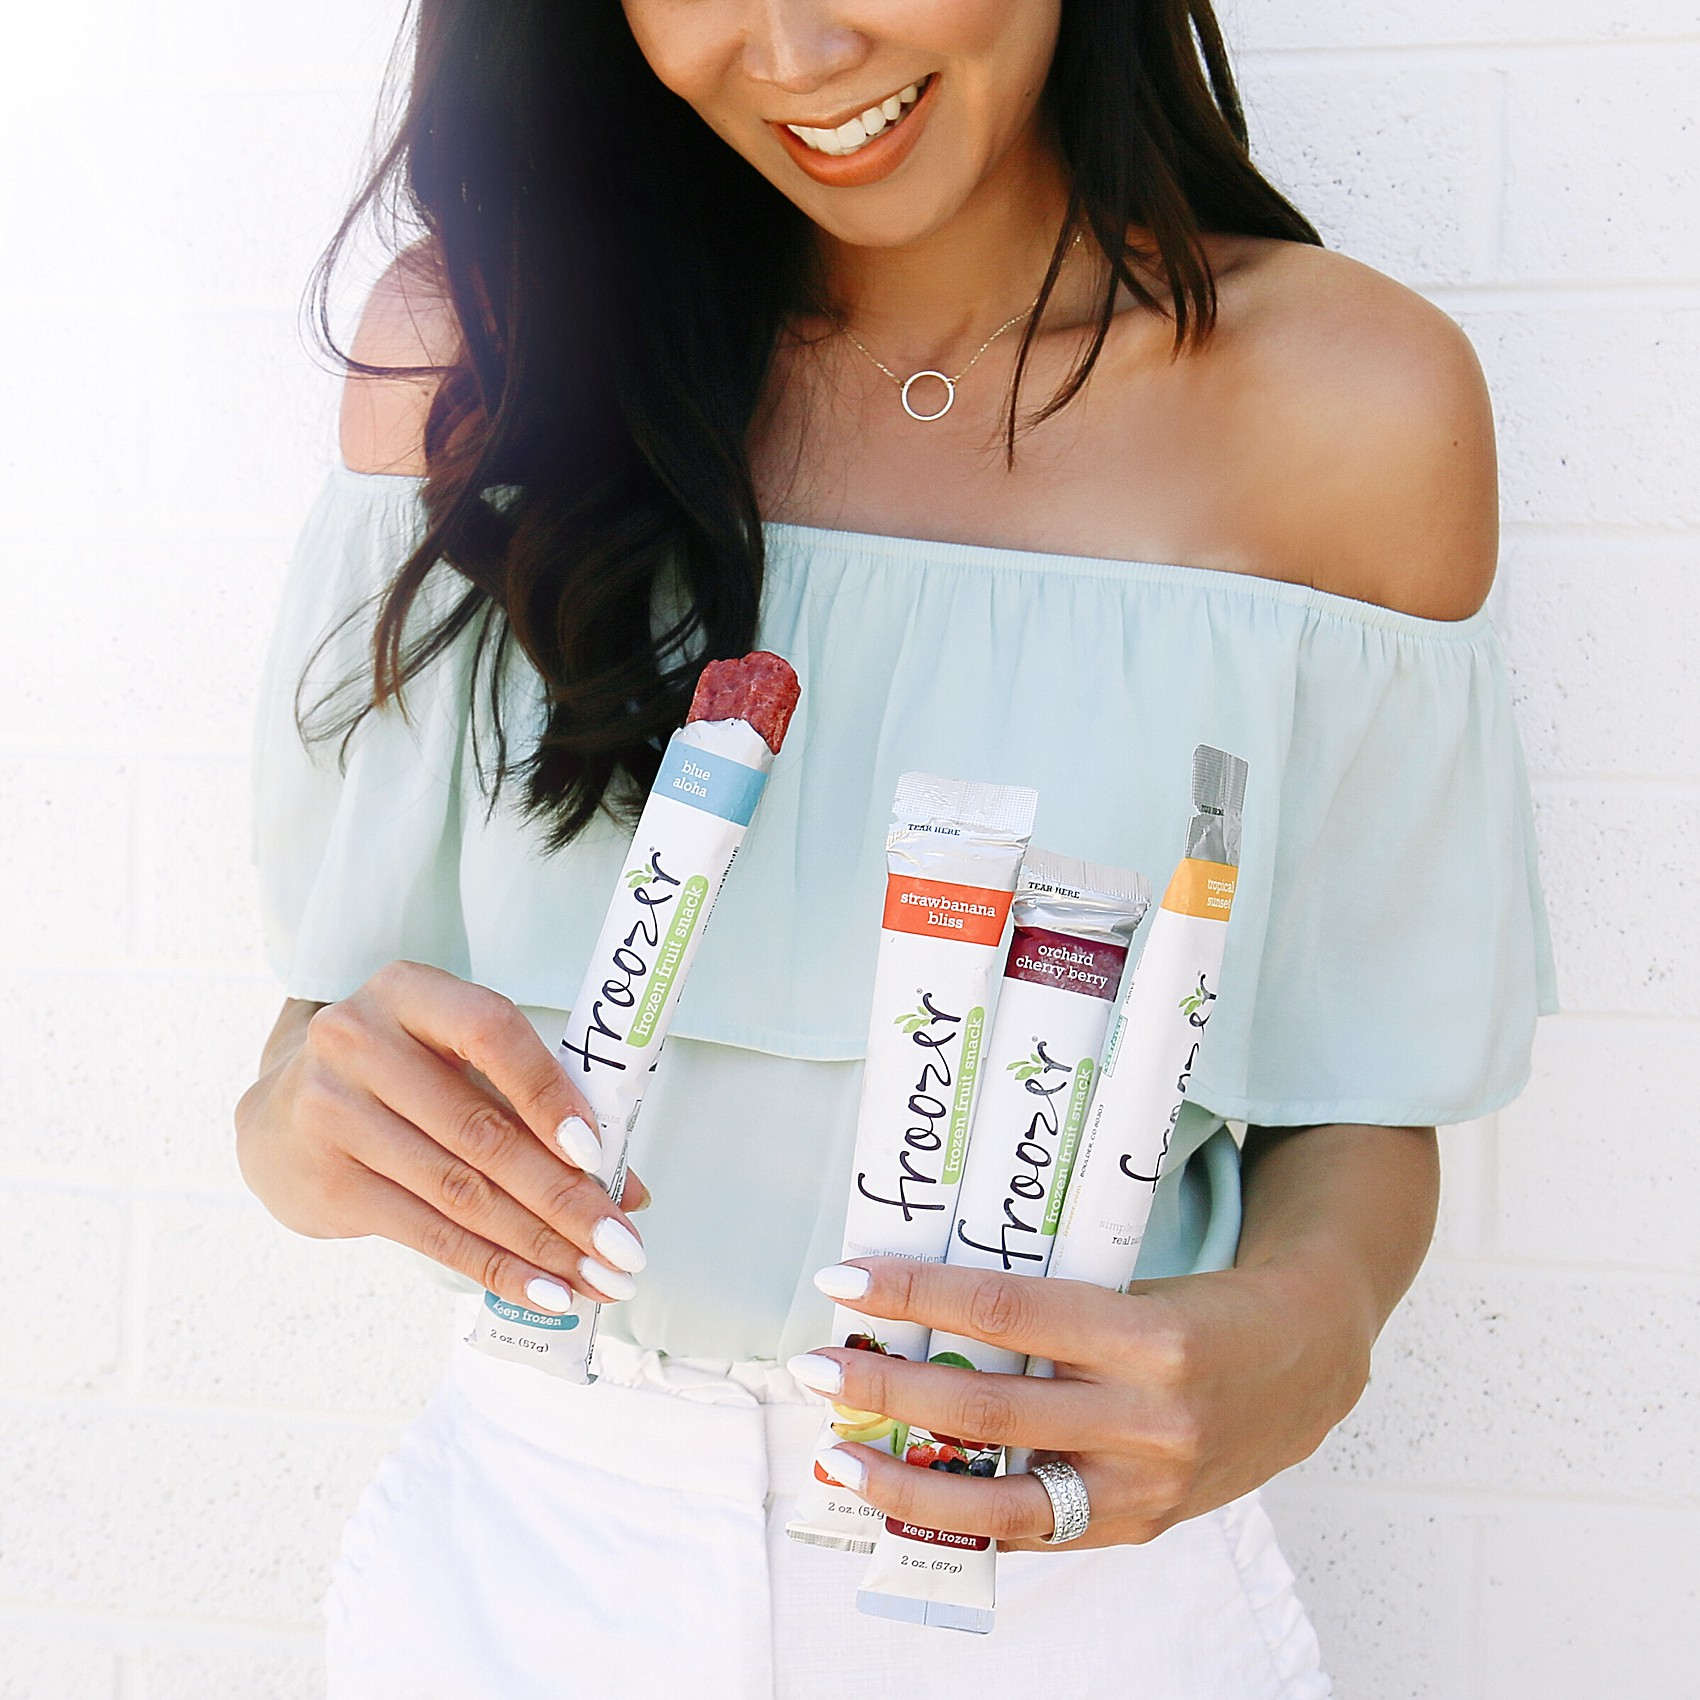 Diana Elizabeth lifestyle blogger in Phoenix holding Froozer pops natural flash frozen fruit popsicles